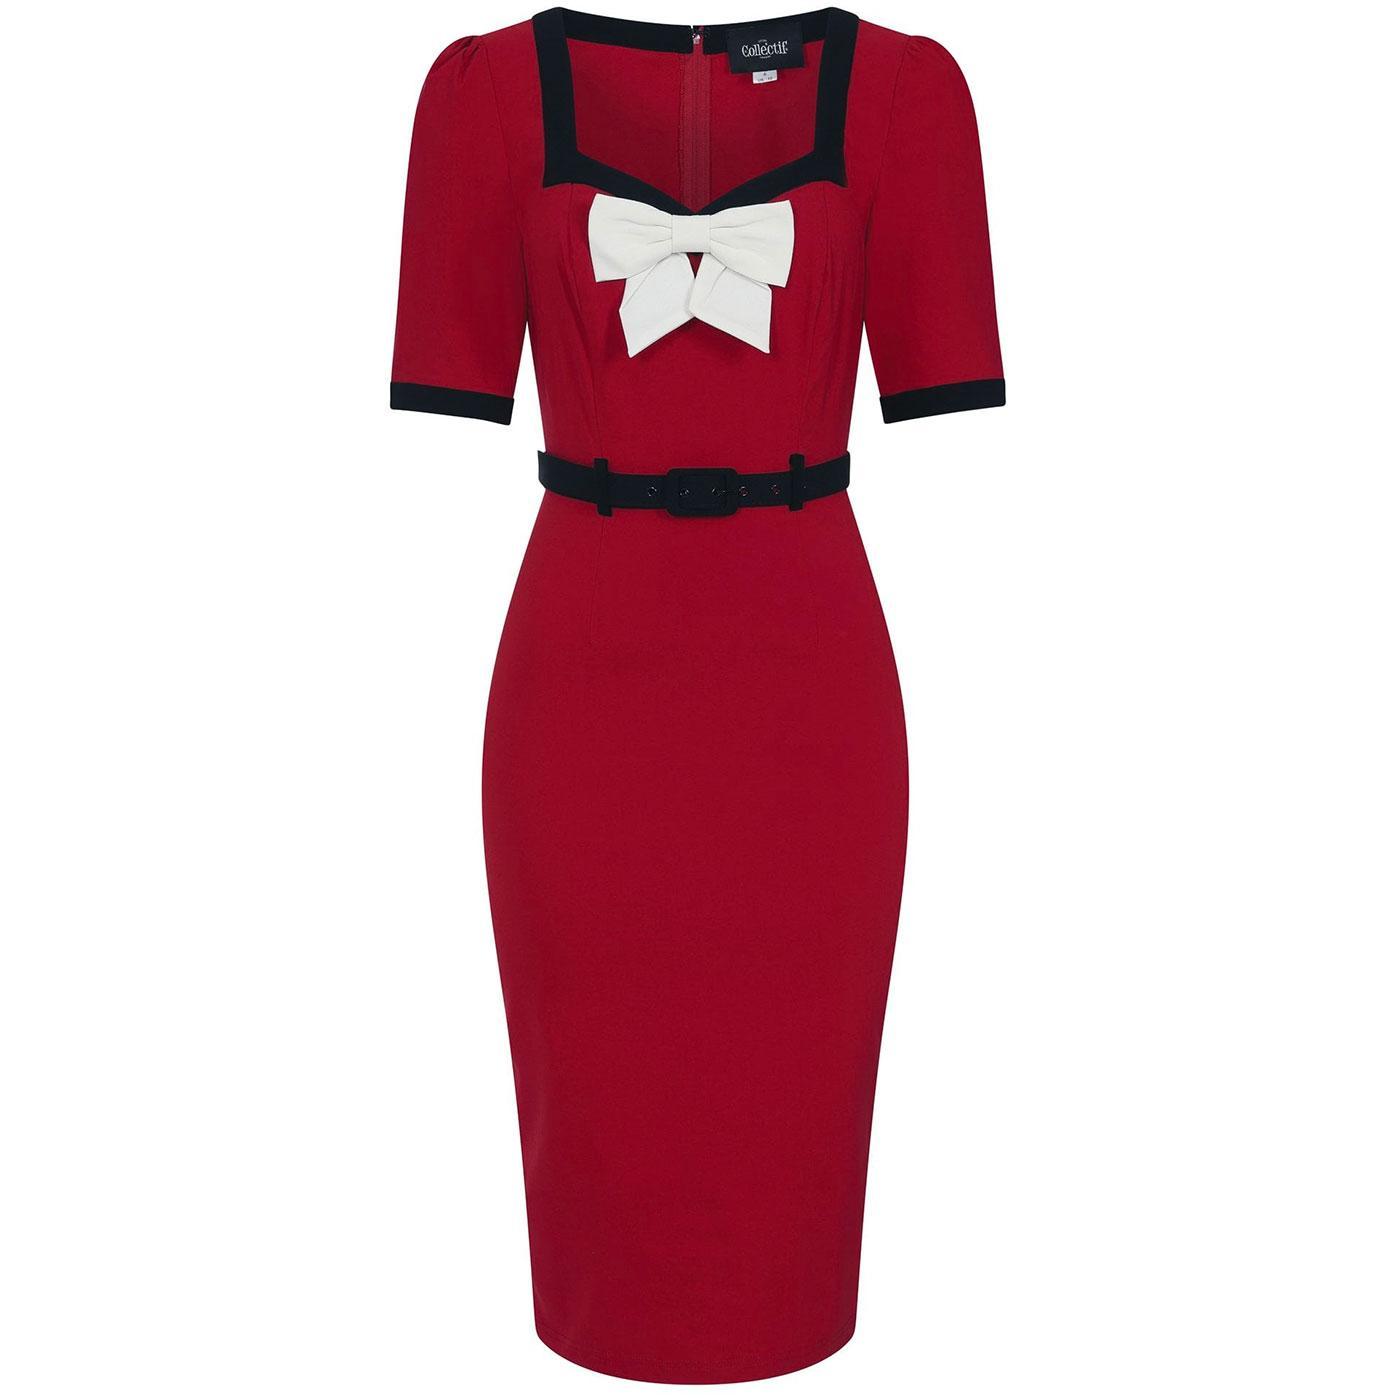 Sadie COLLECTIF Retro 50s Pencil Dress (Red)